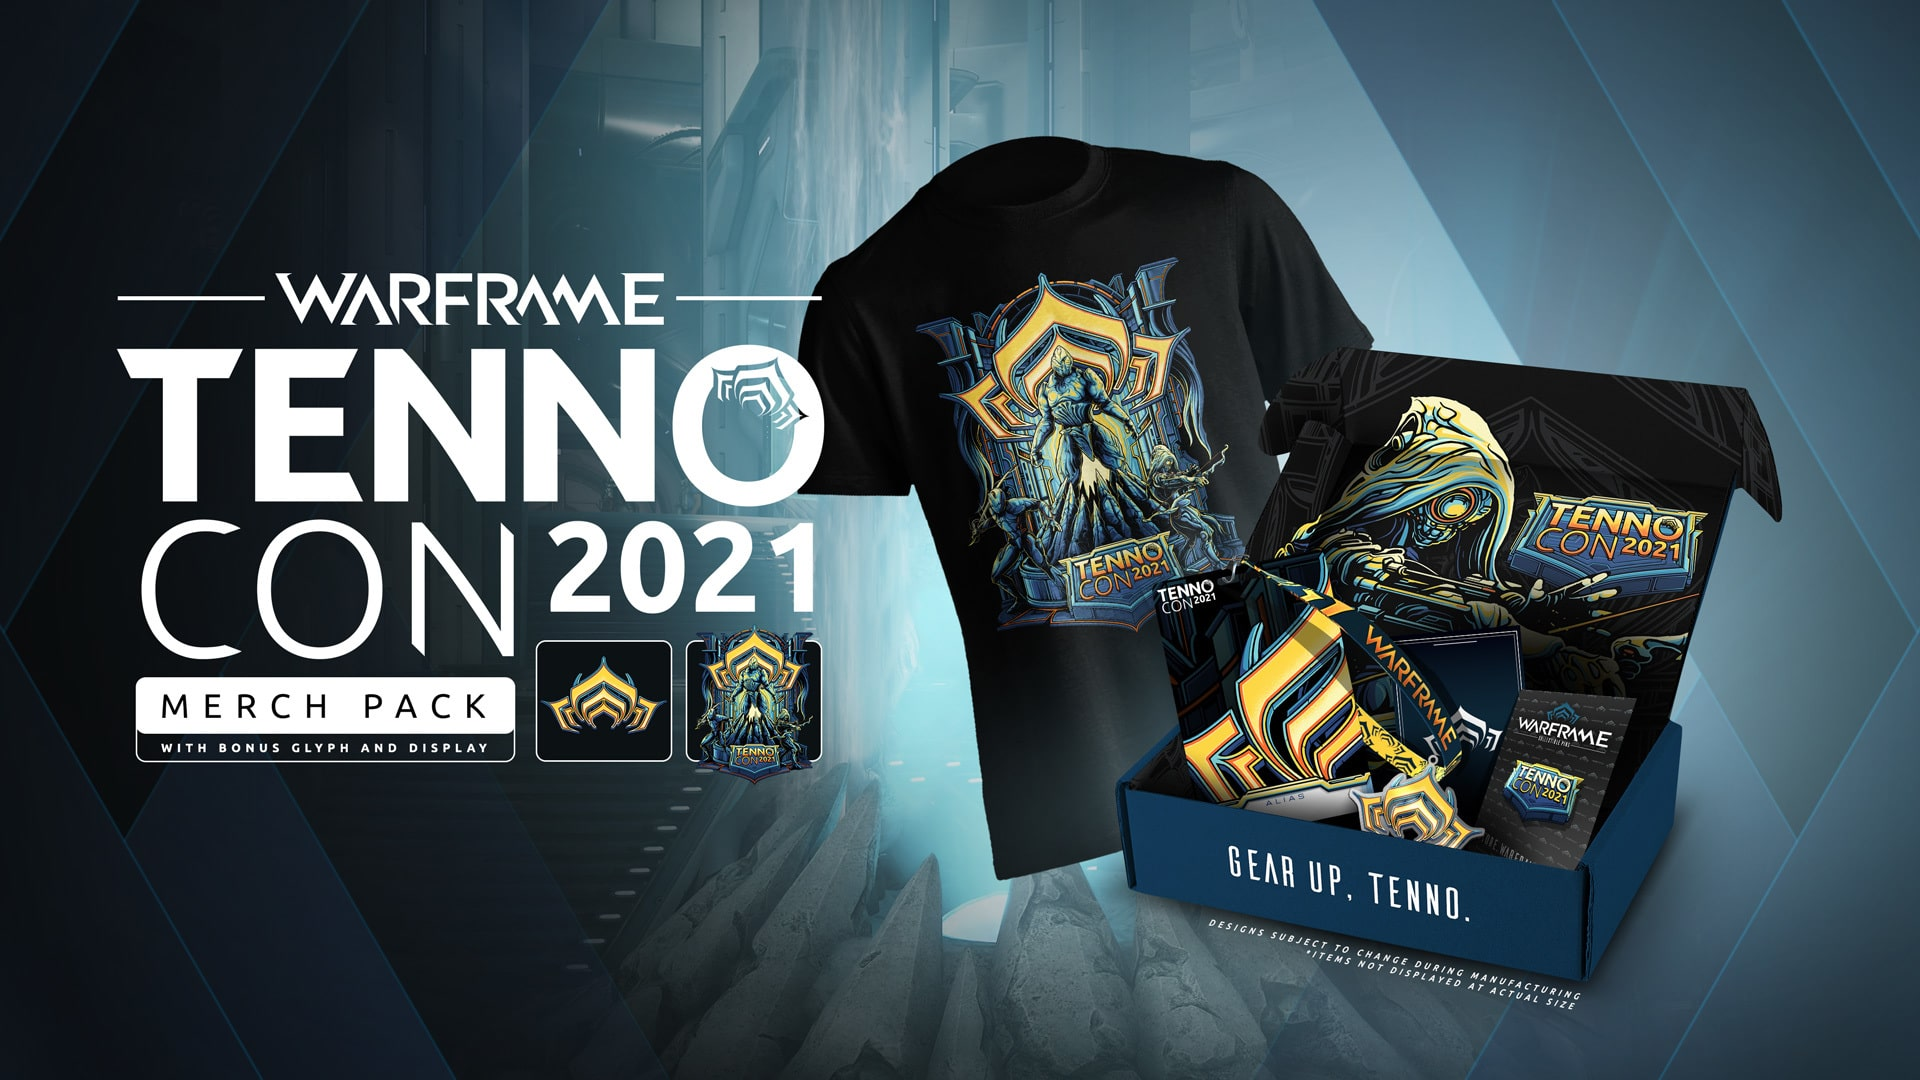 Warframe Tennocon 2021 Merch Pack Oyunpat min-oyunpat